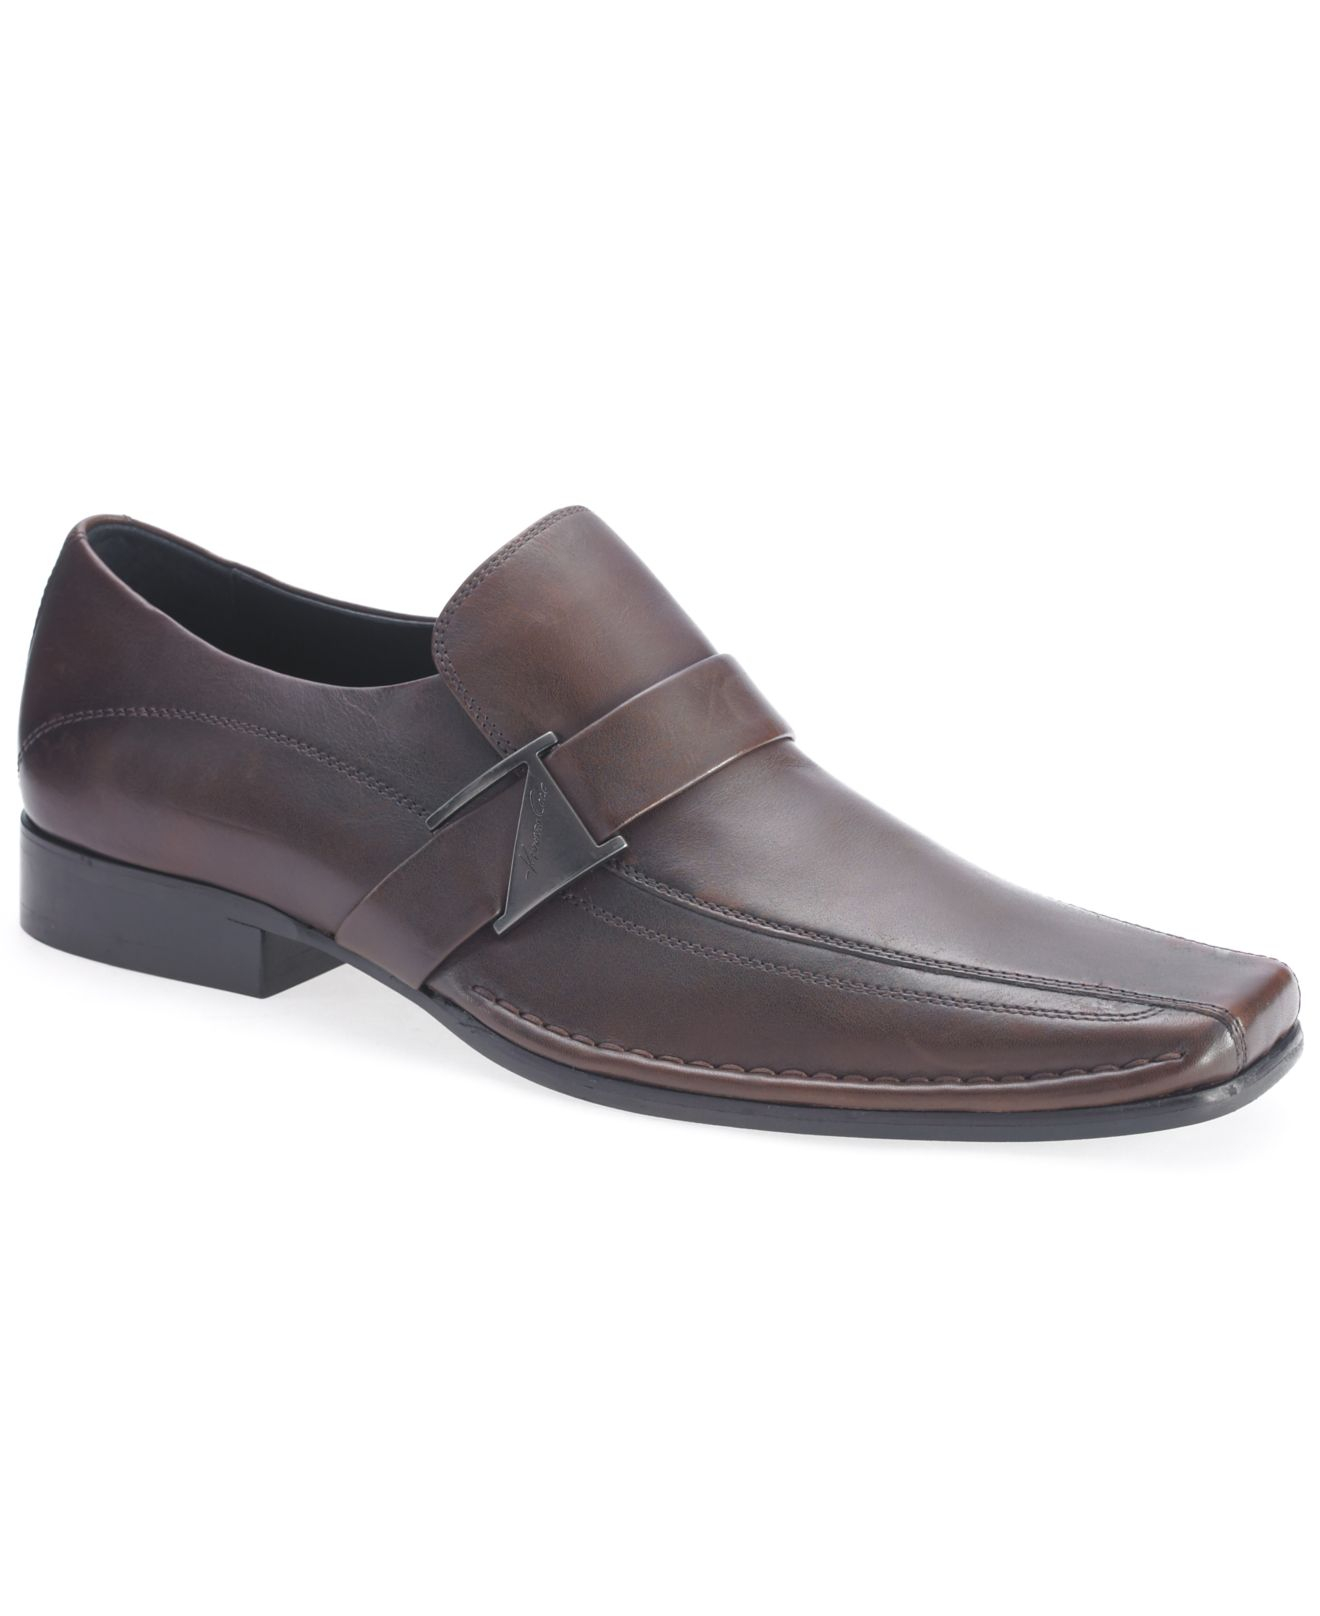 Kenneth Cole Slip On Shoes Run Around Strap